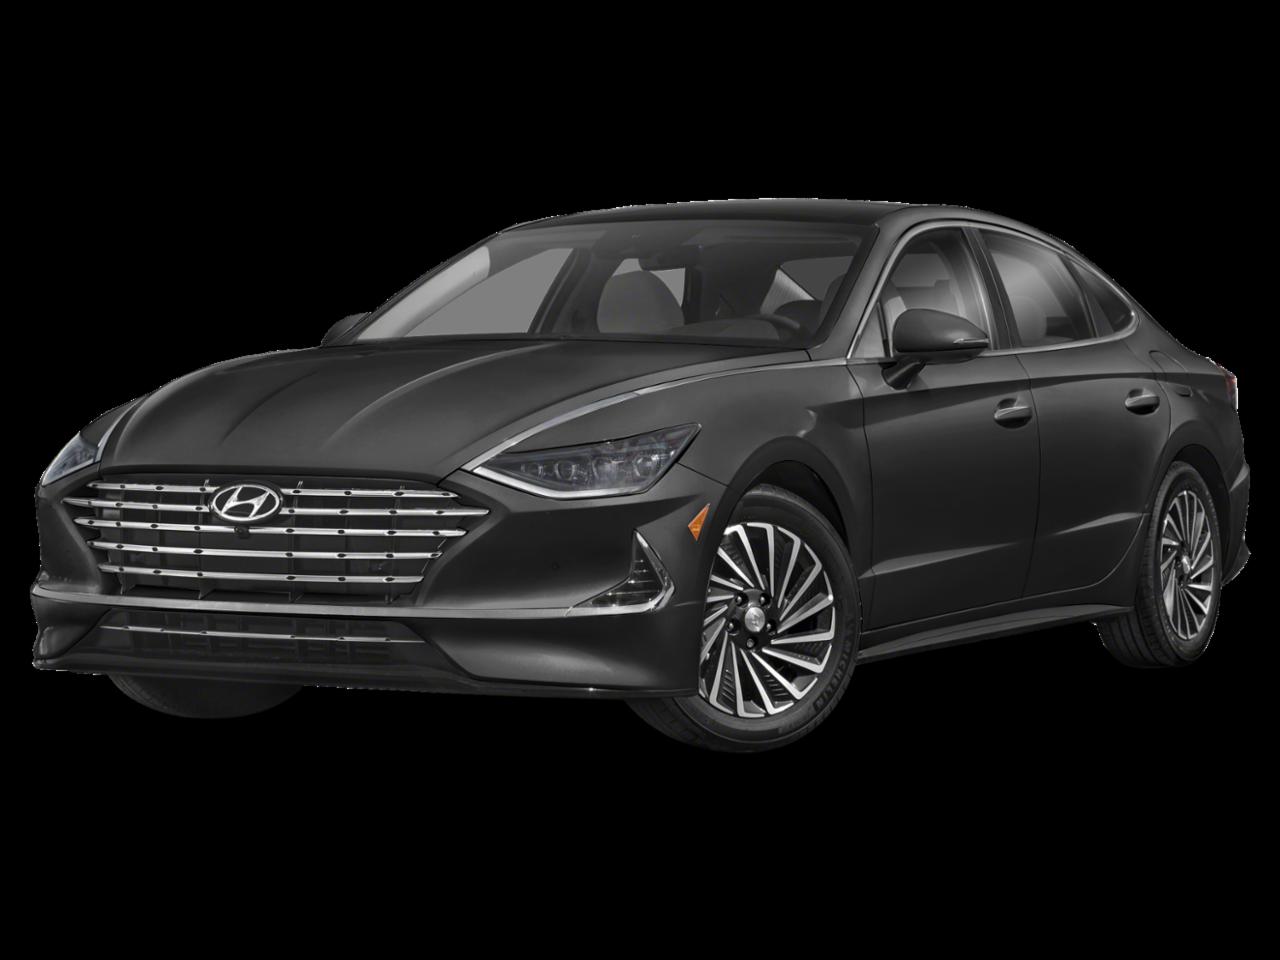 Hyundai 2021 Sonata Hybrid Limited